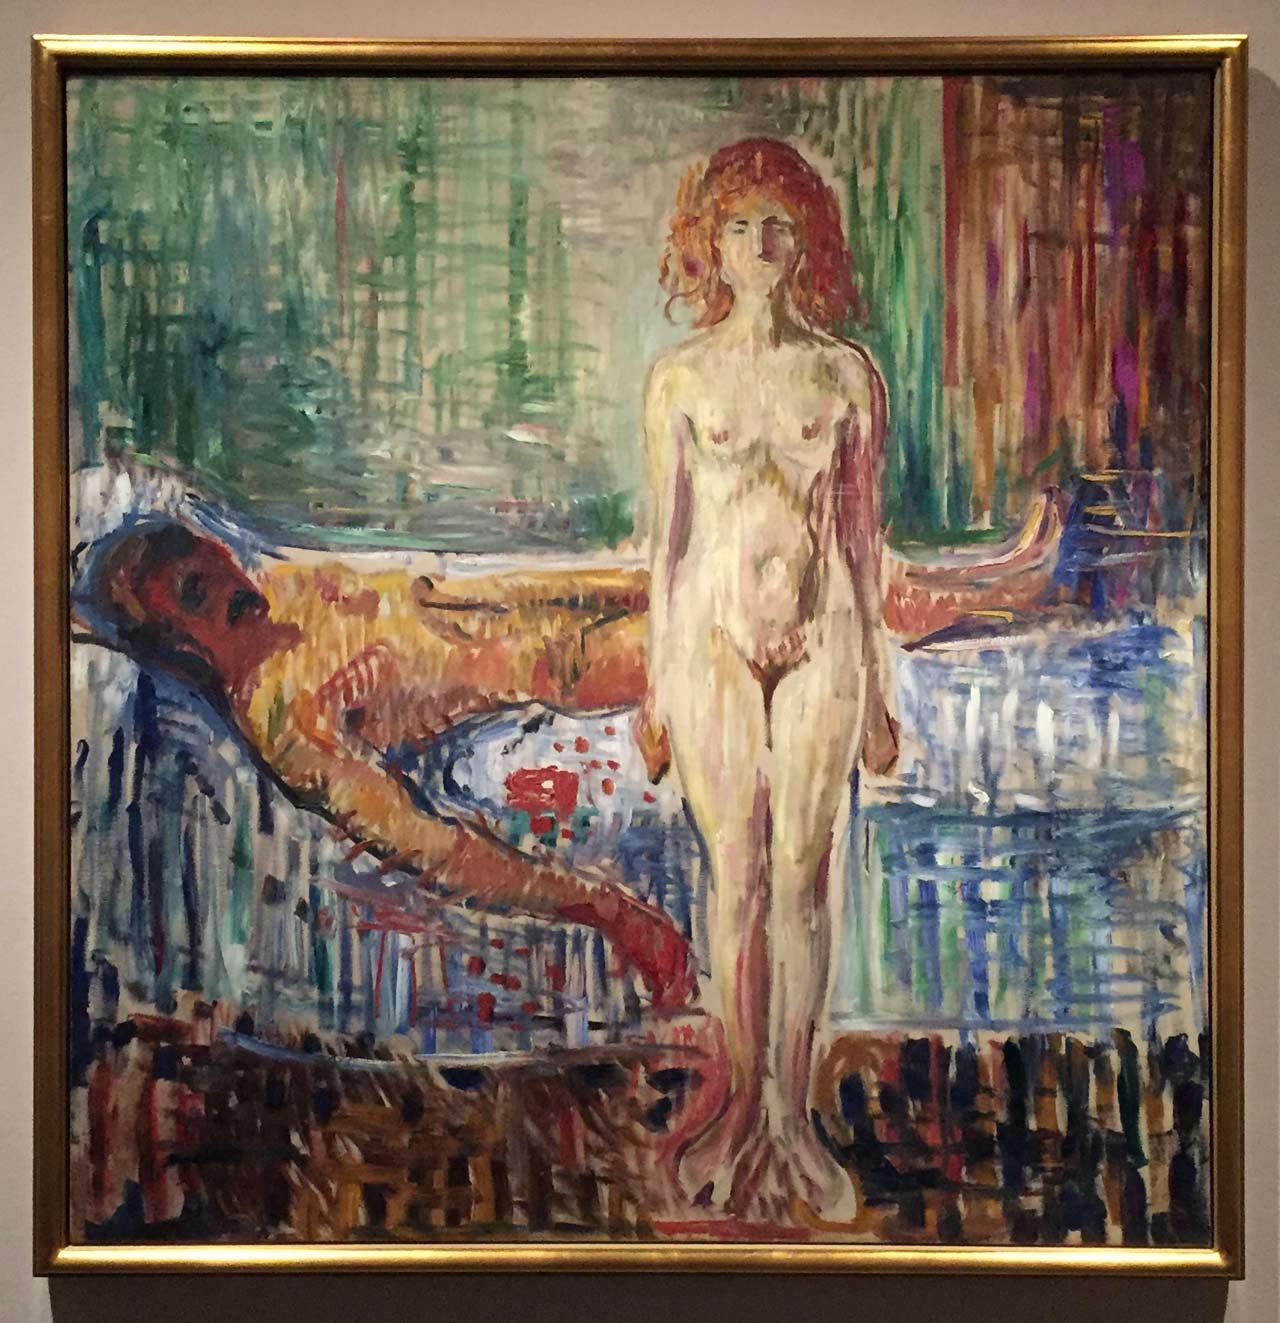 Edvard-Munch-Death-Marat-1907-Munch-Museum.jpg